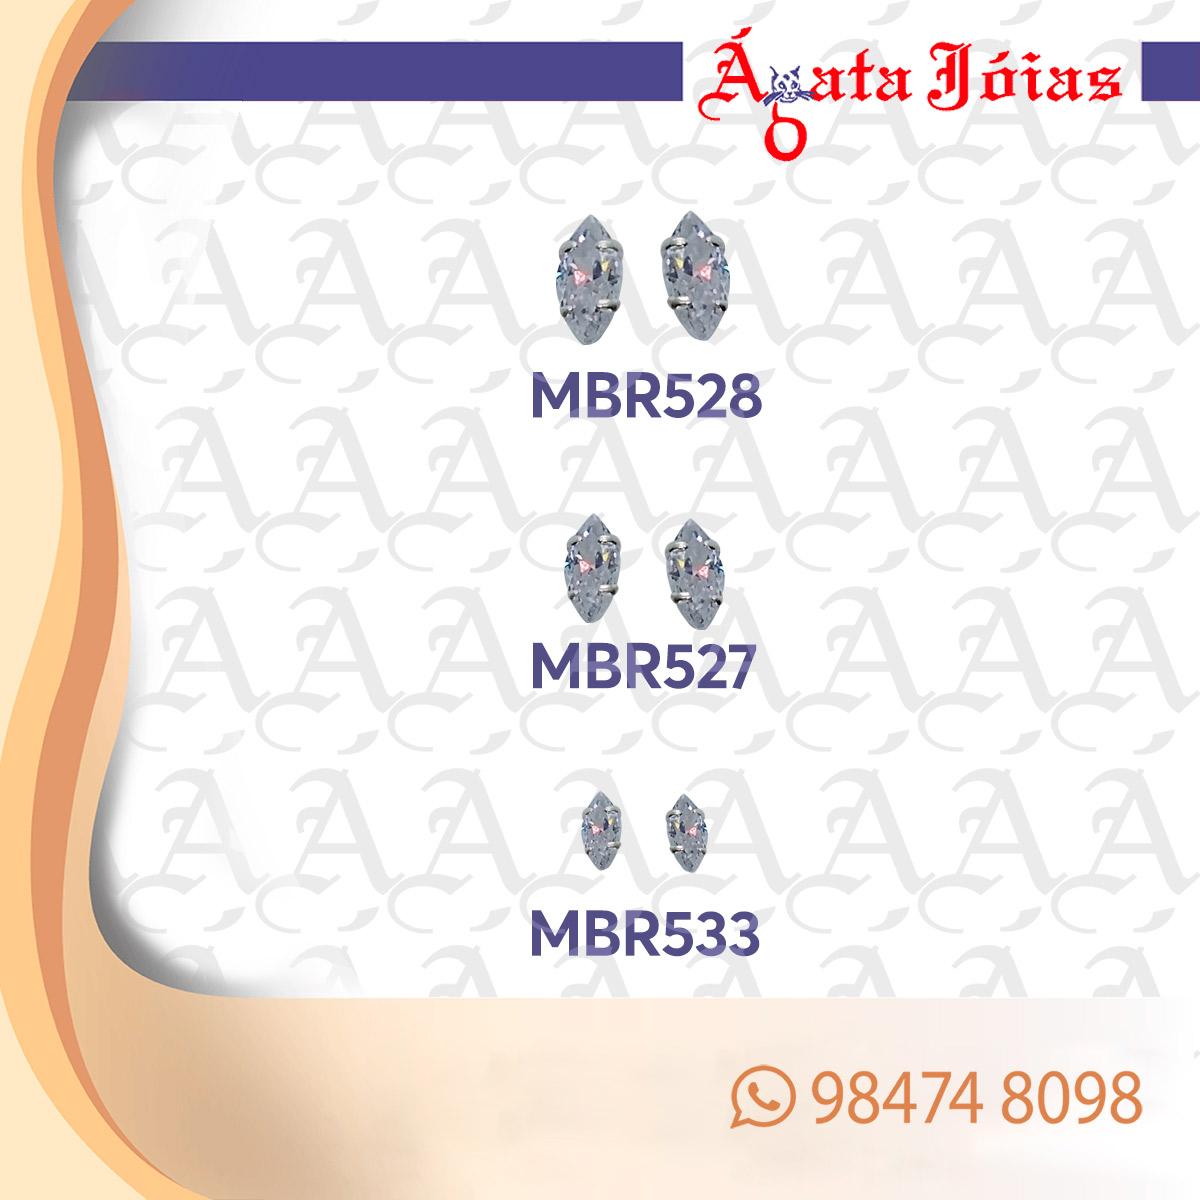 MBR528